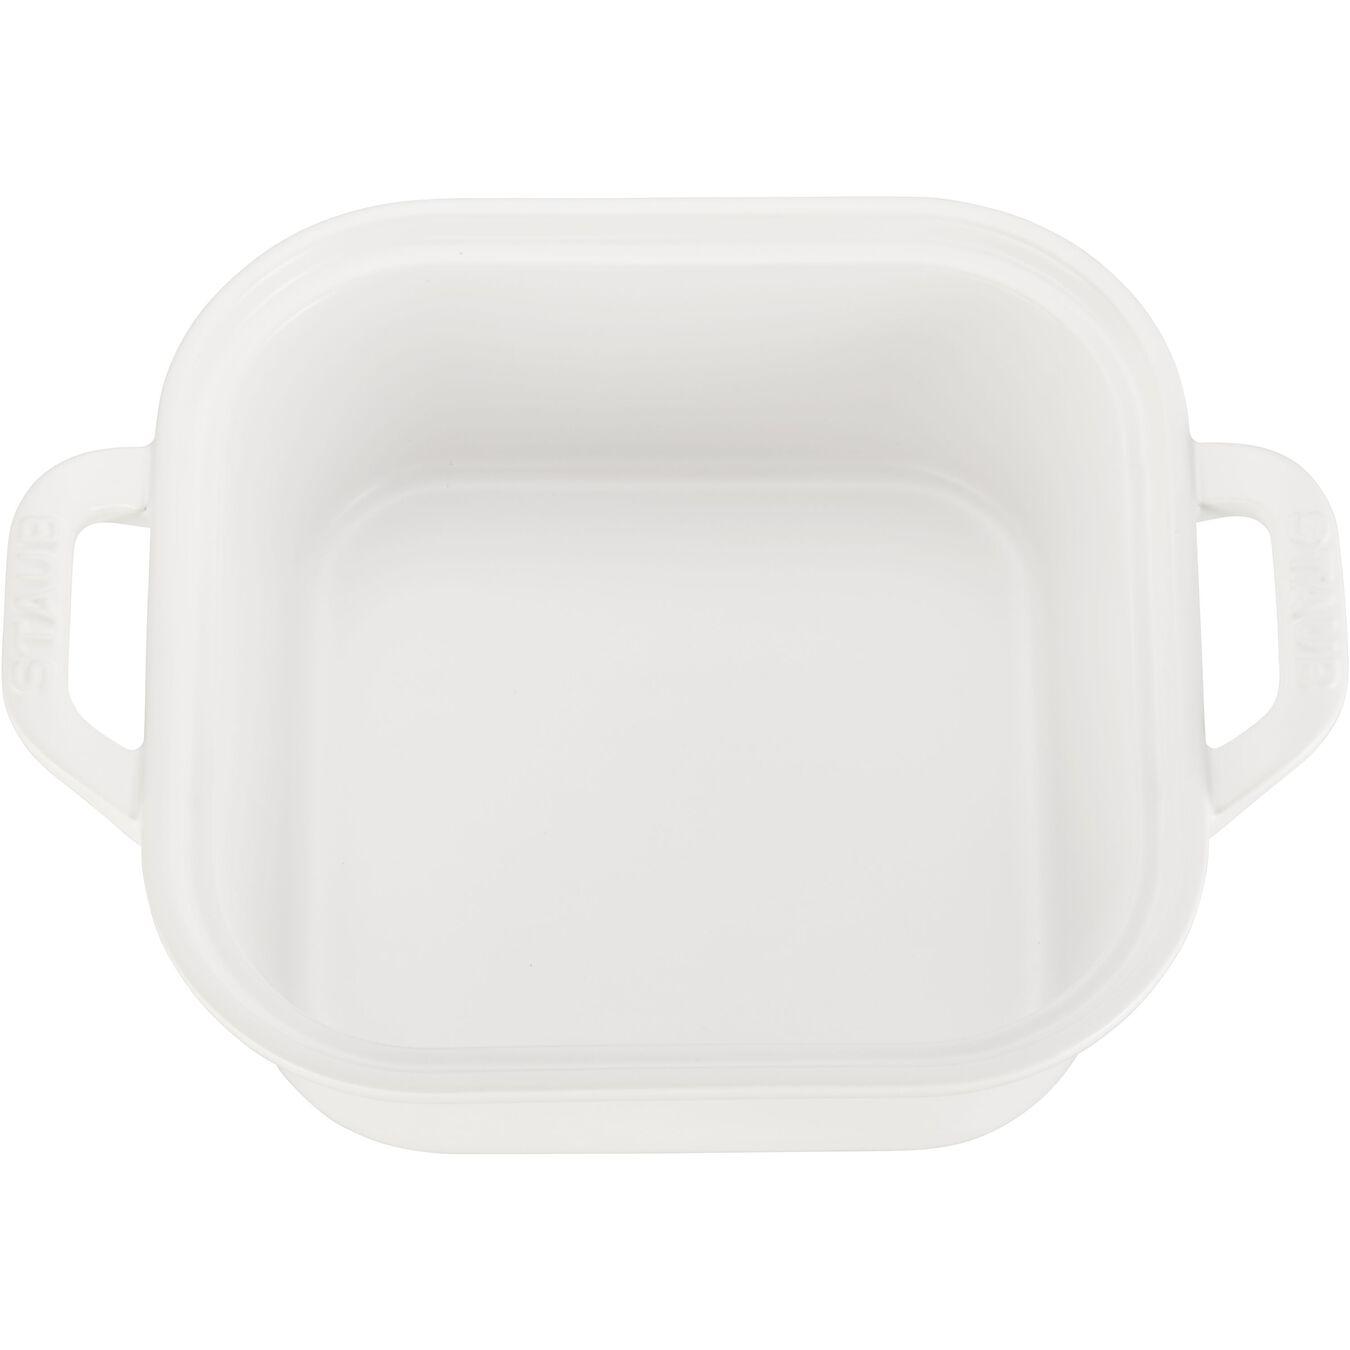 Ceramic square Special shape bakeware, matte-white,,large 4